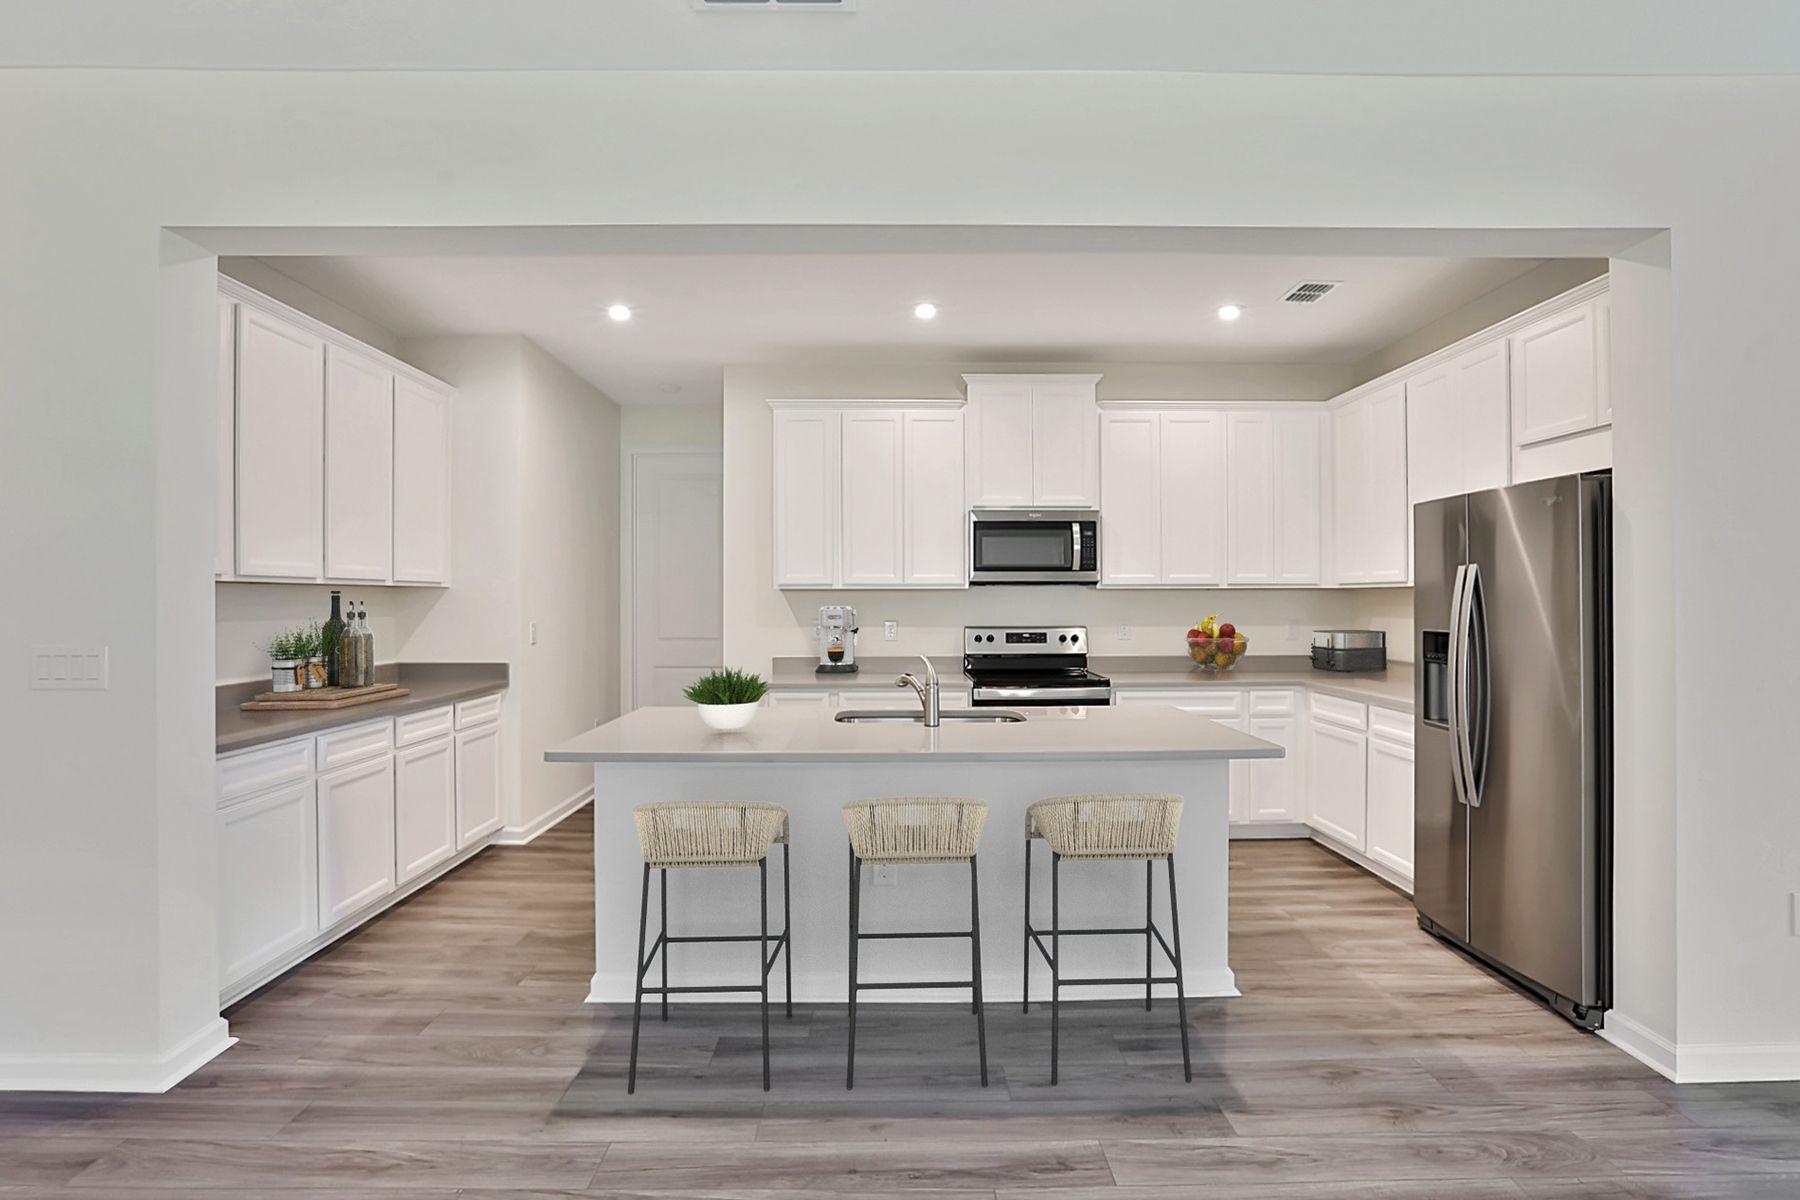 Kitchen featured in the Antigua II By Mattamy Homes in Sarasota-Bradenton, FL